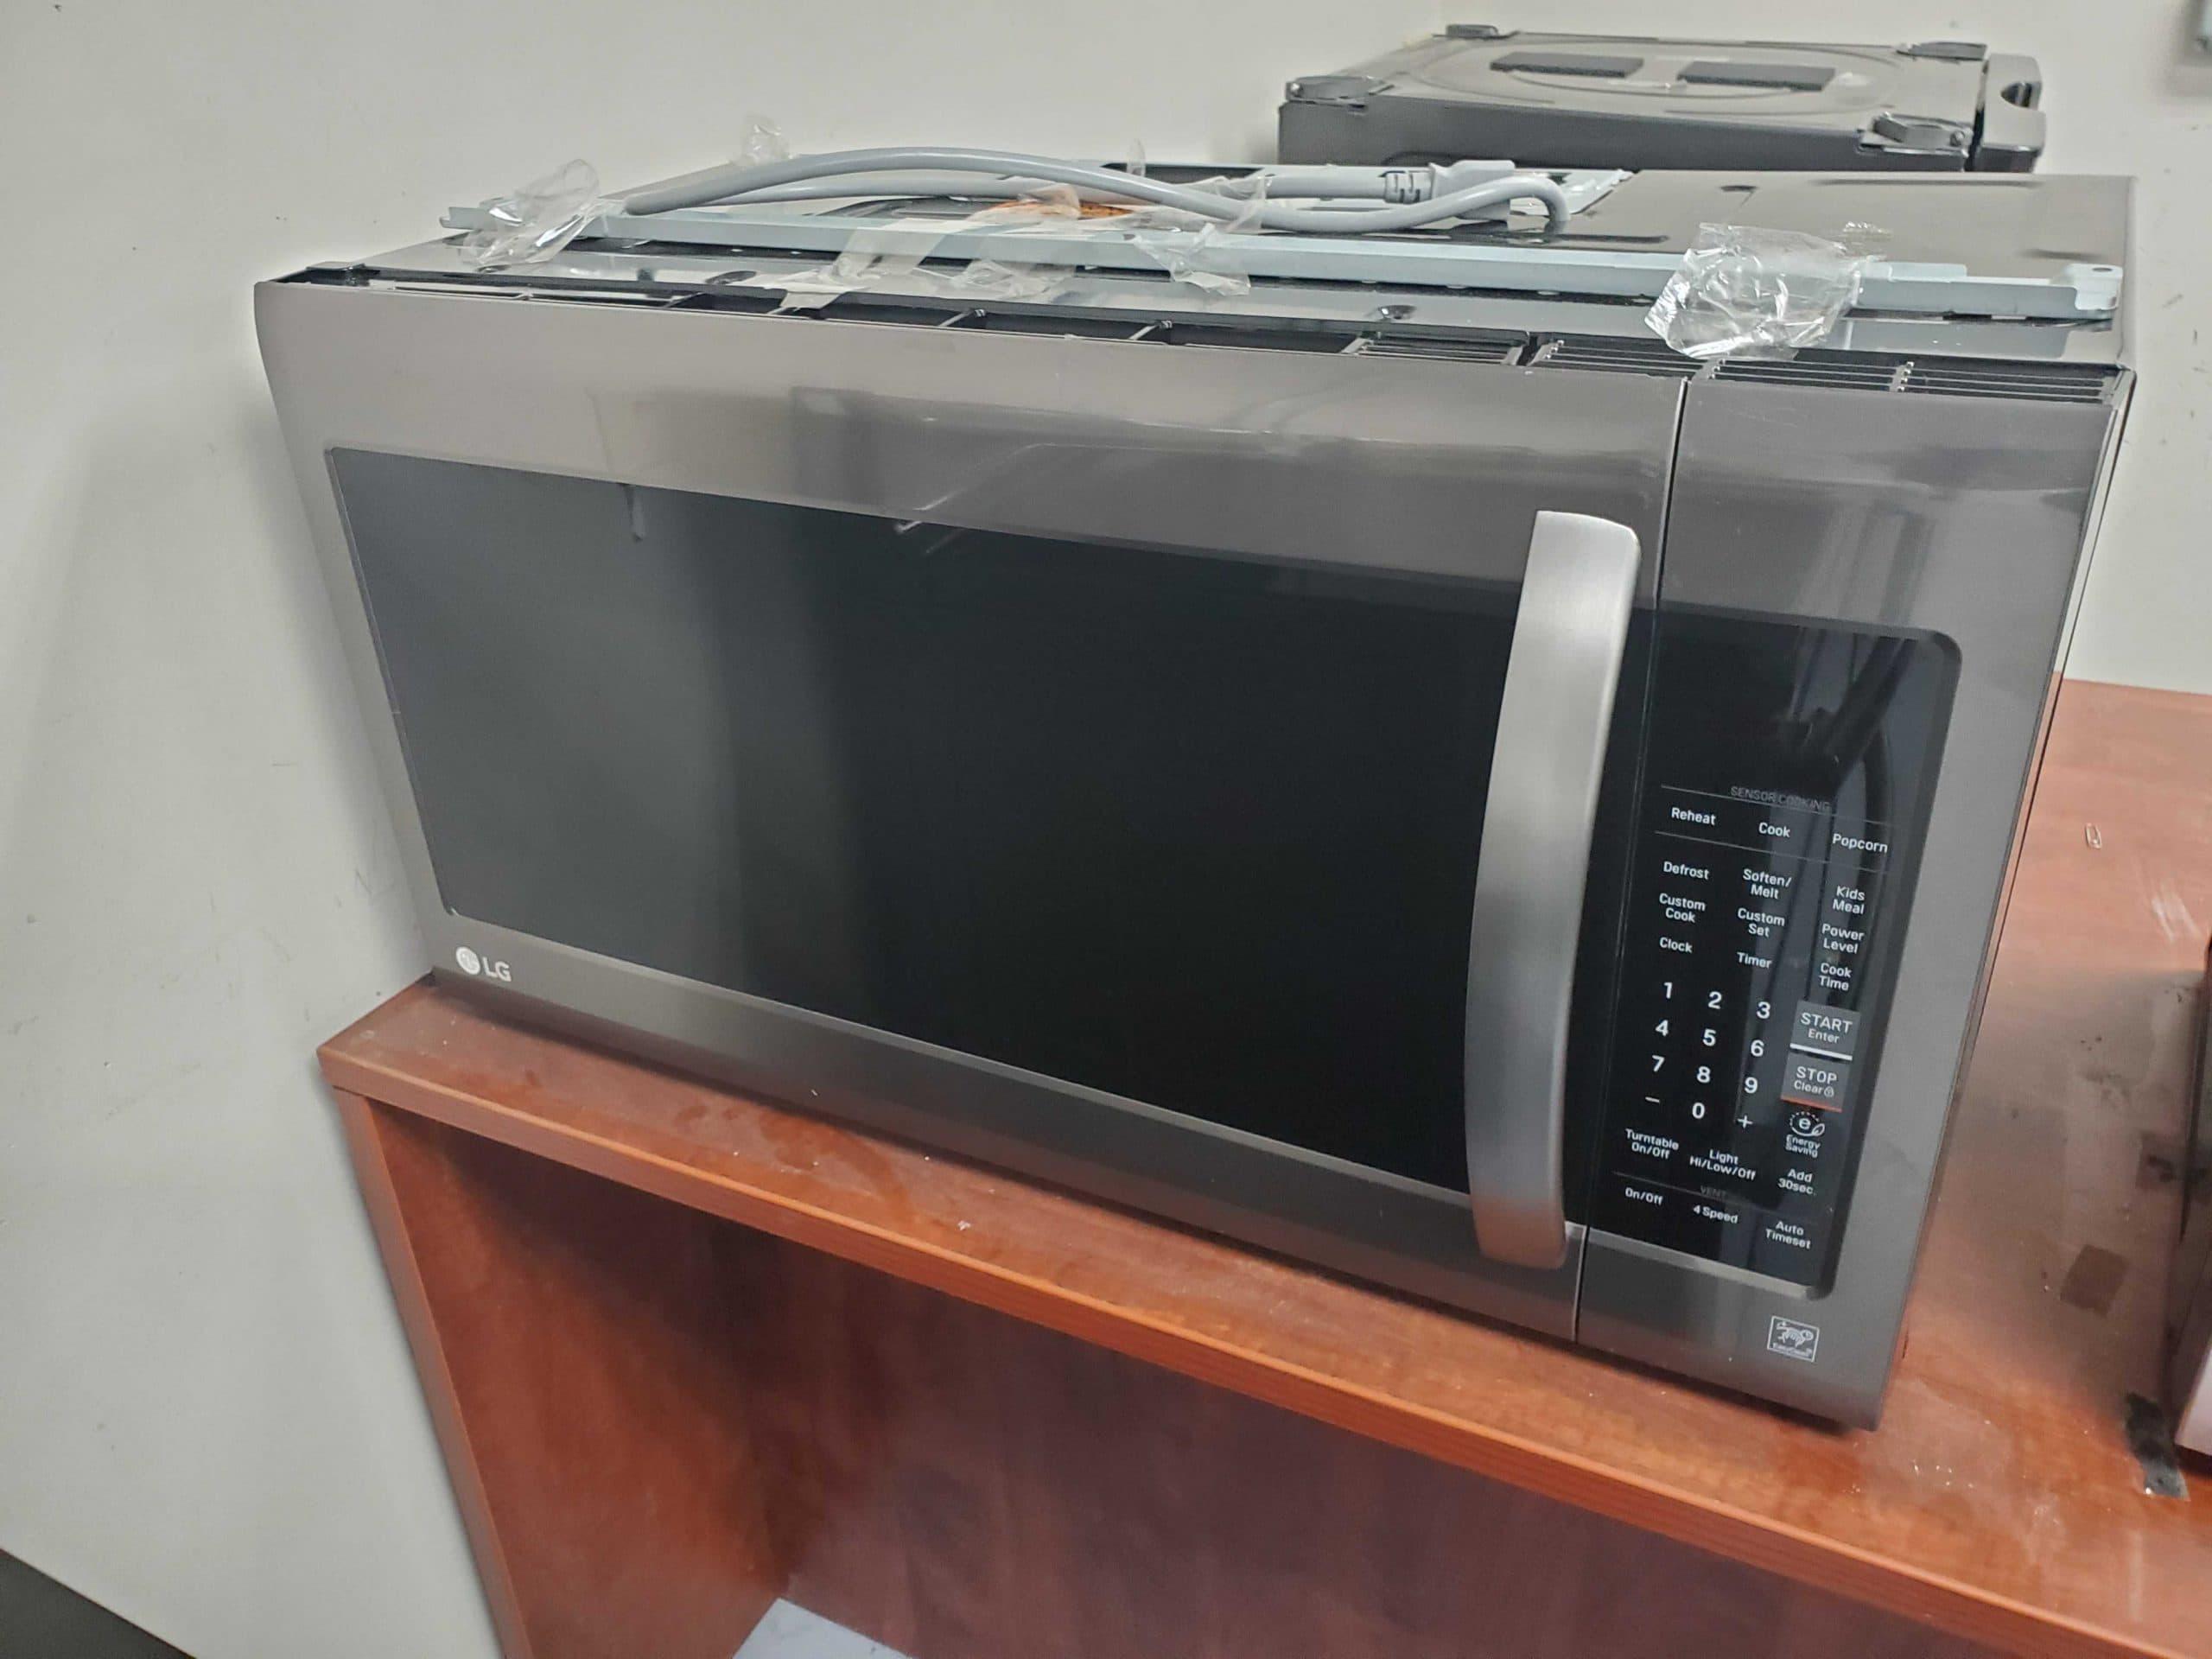 lg 2 cu ft over the range microwave with sensor cooking fingerprint resistant black stainless steel